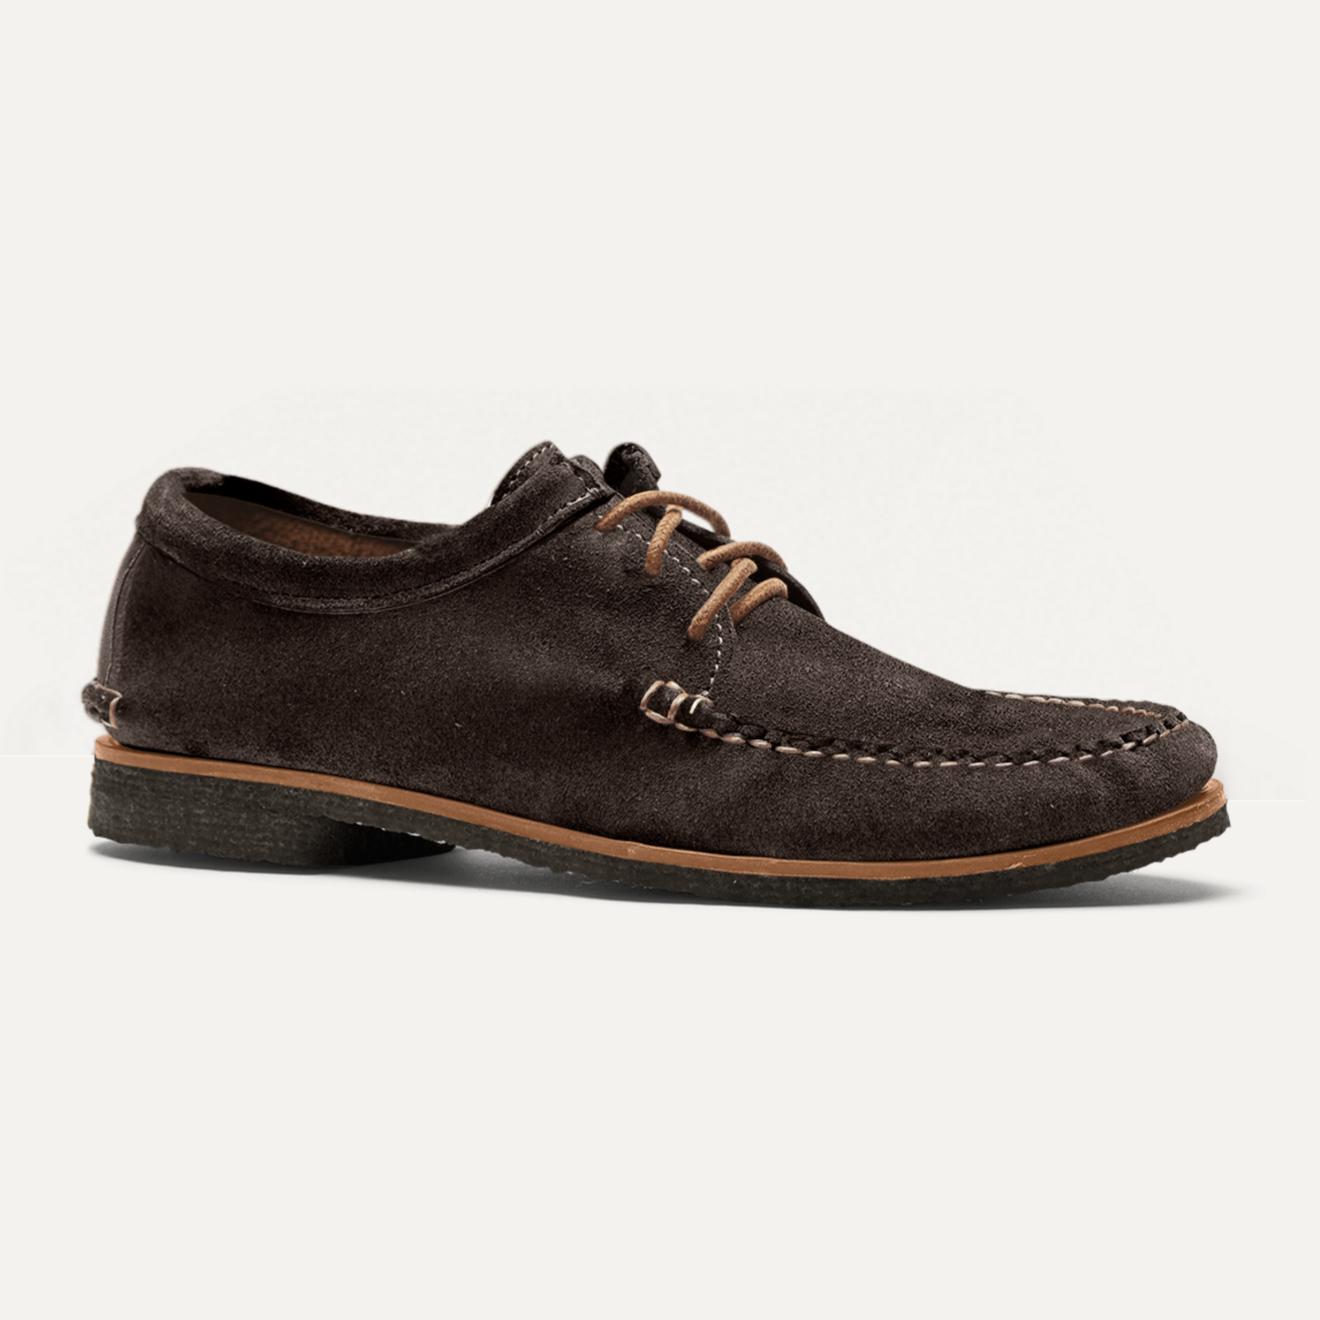 Quoddy - Casual Shoes - Tukabuk Chocolate